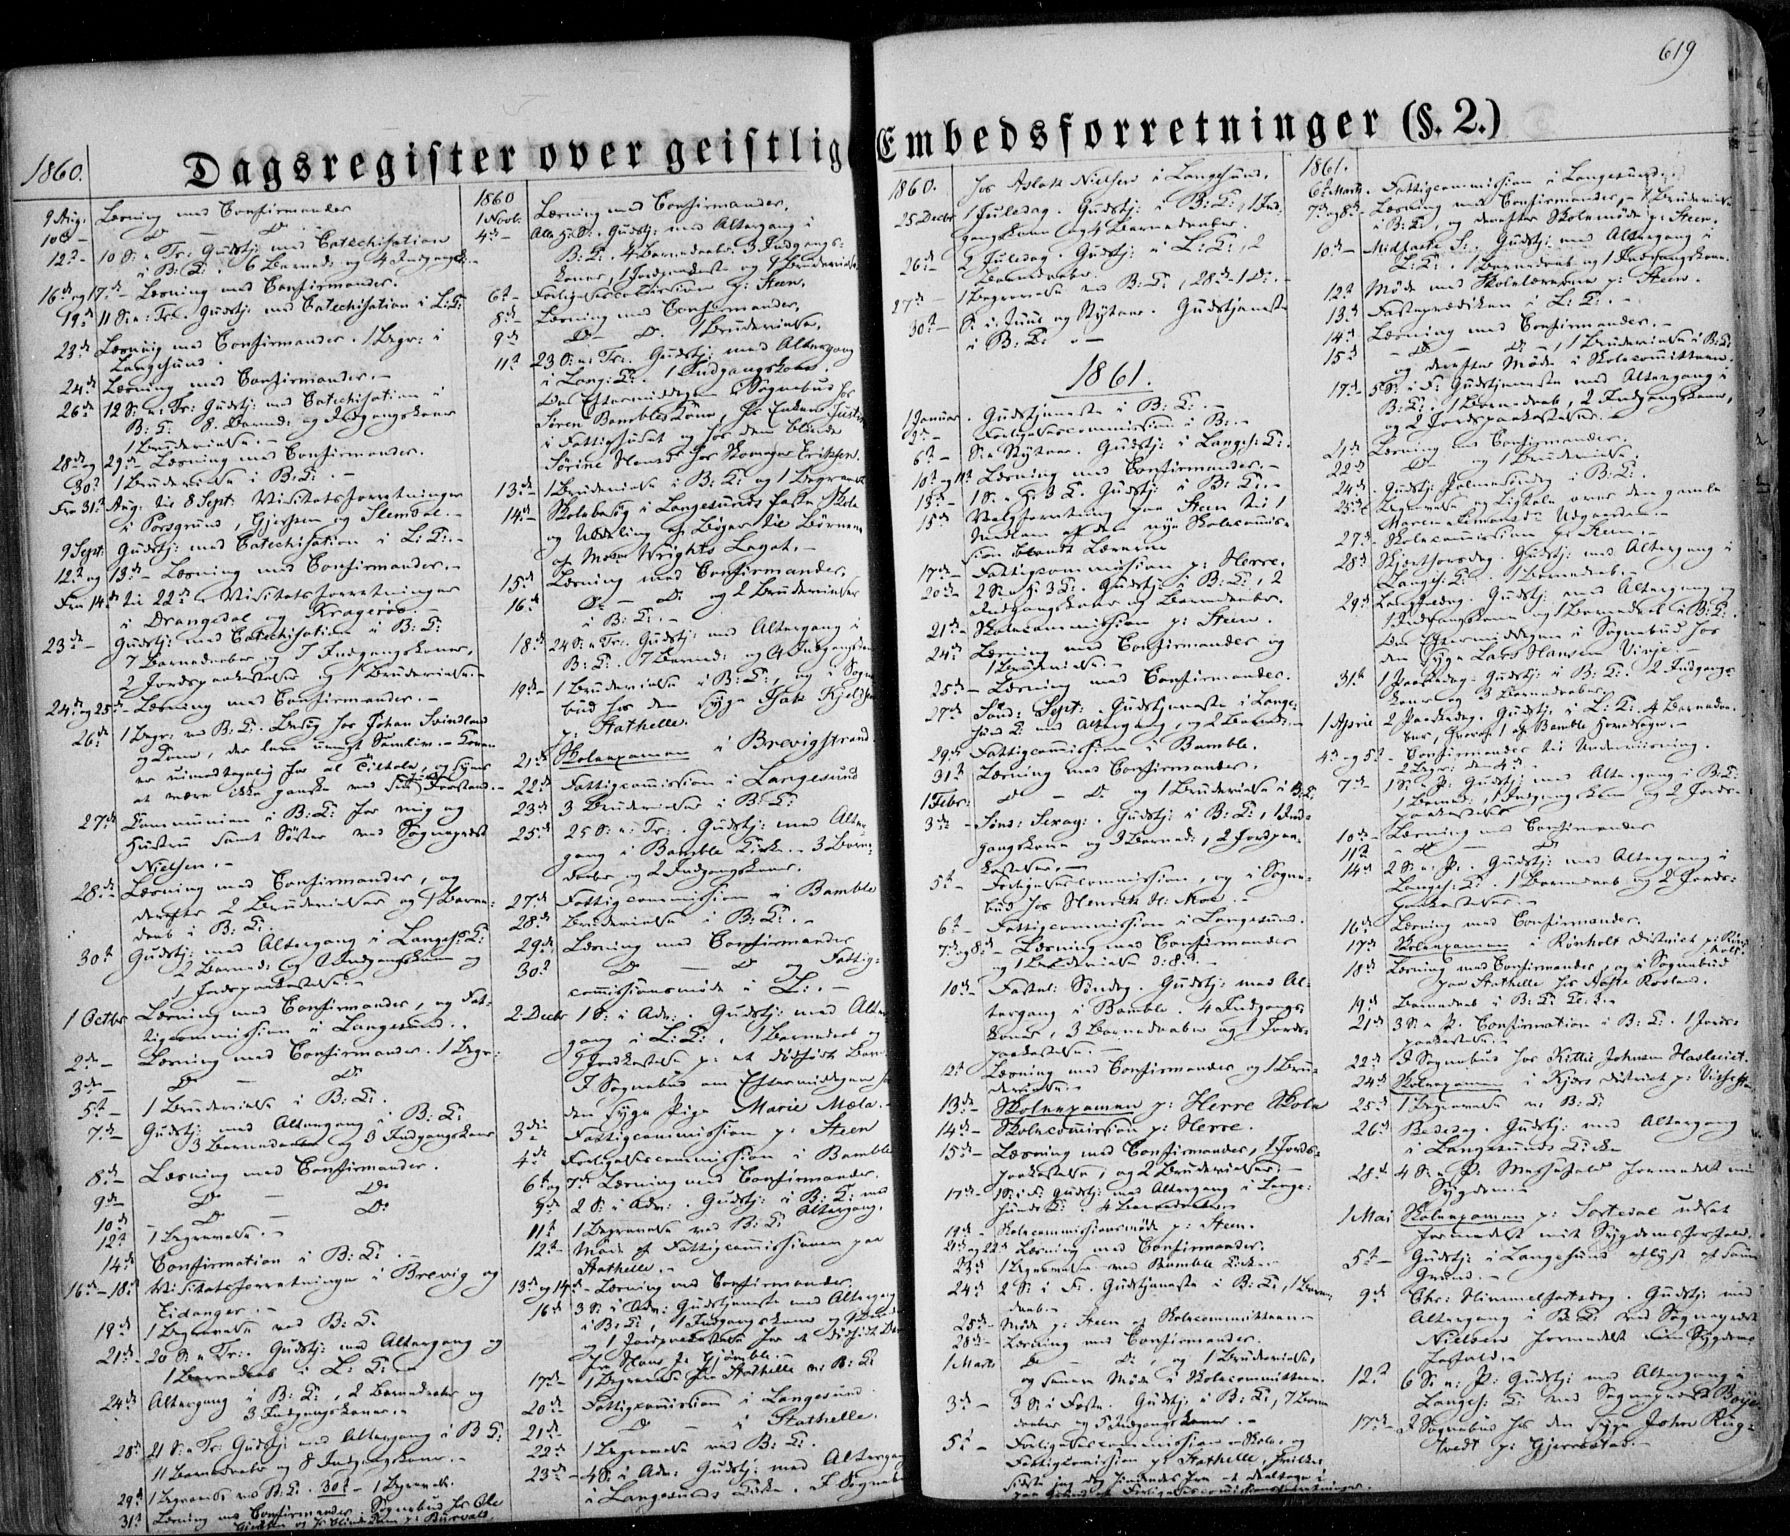 SAKO, Bamble kirkebøker, F/Fa/L0005: Ministerialbok nr. I 5, 1854-1869, s. 619